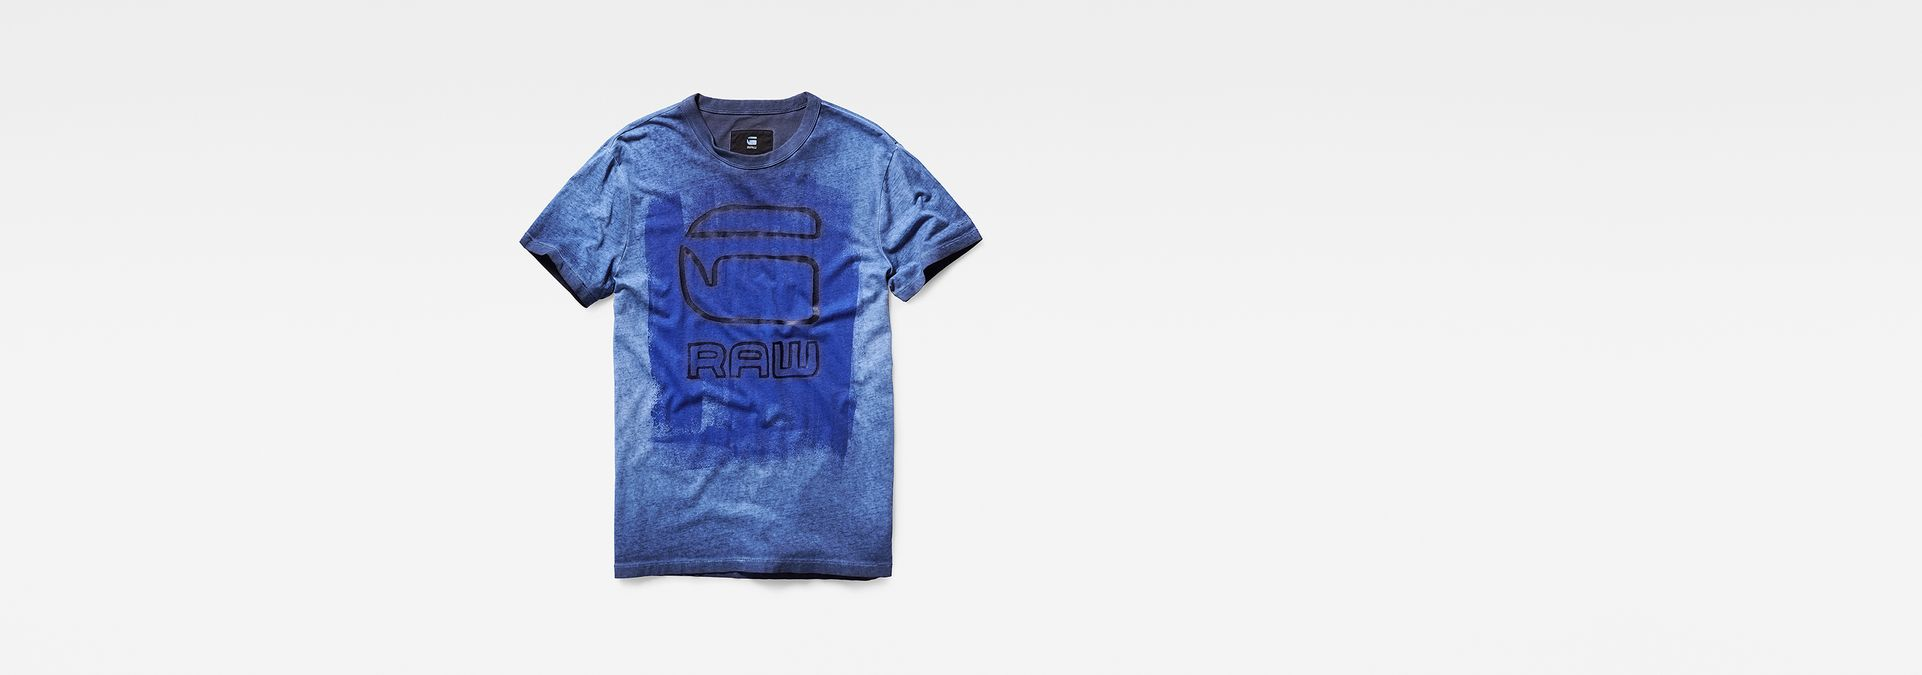 xartic t shirt sartho blue men sale g star raw. Black Bedroom Furniture Sets. Home Design Ideas